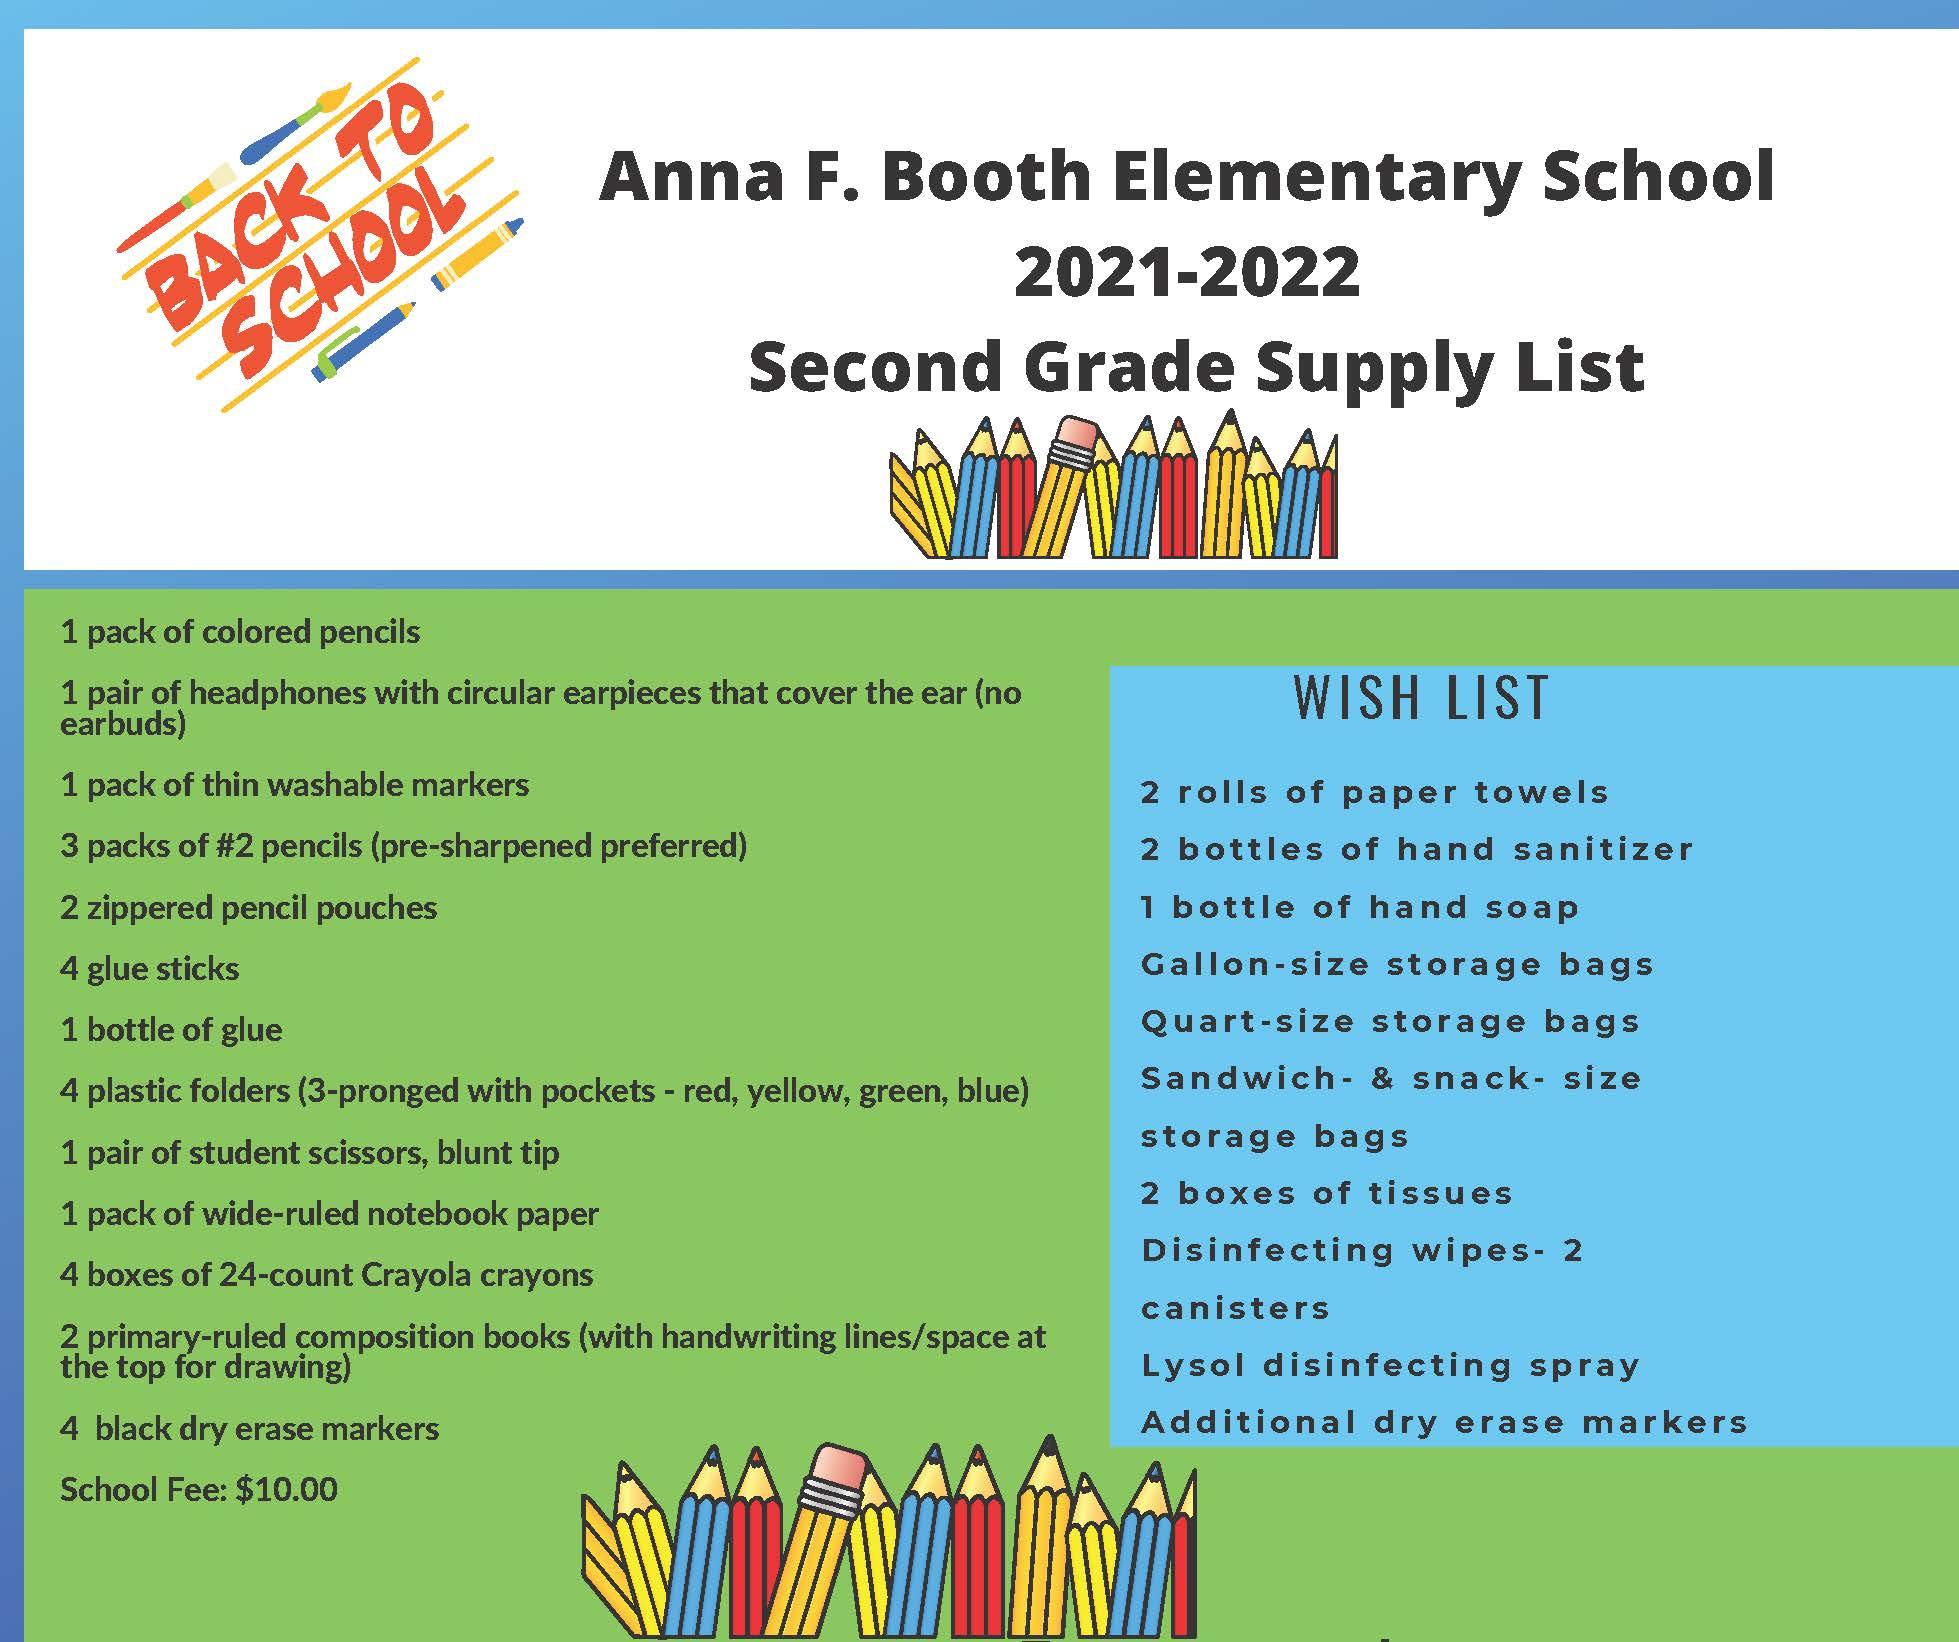 Second Grade Supply List